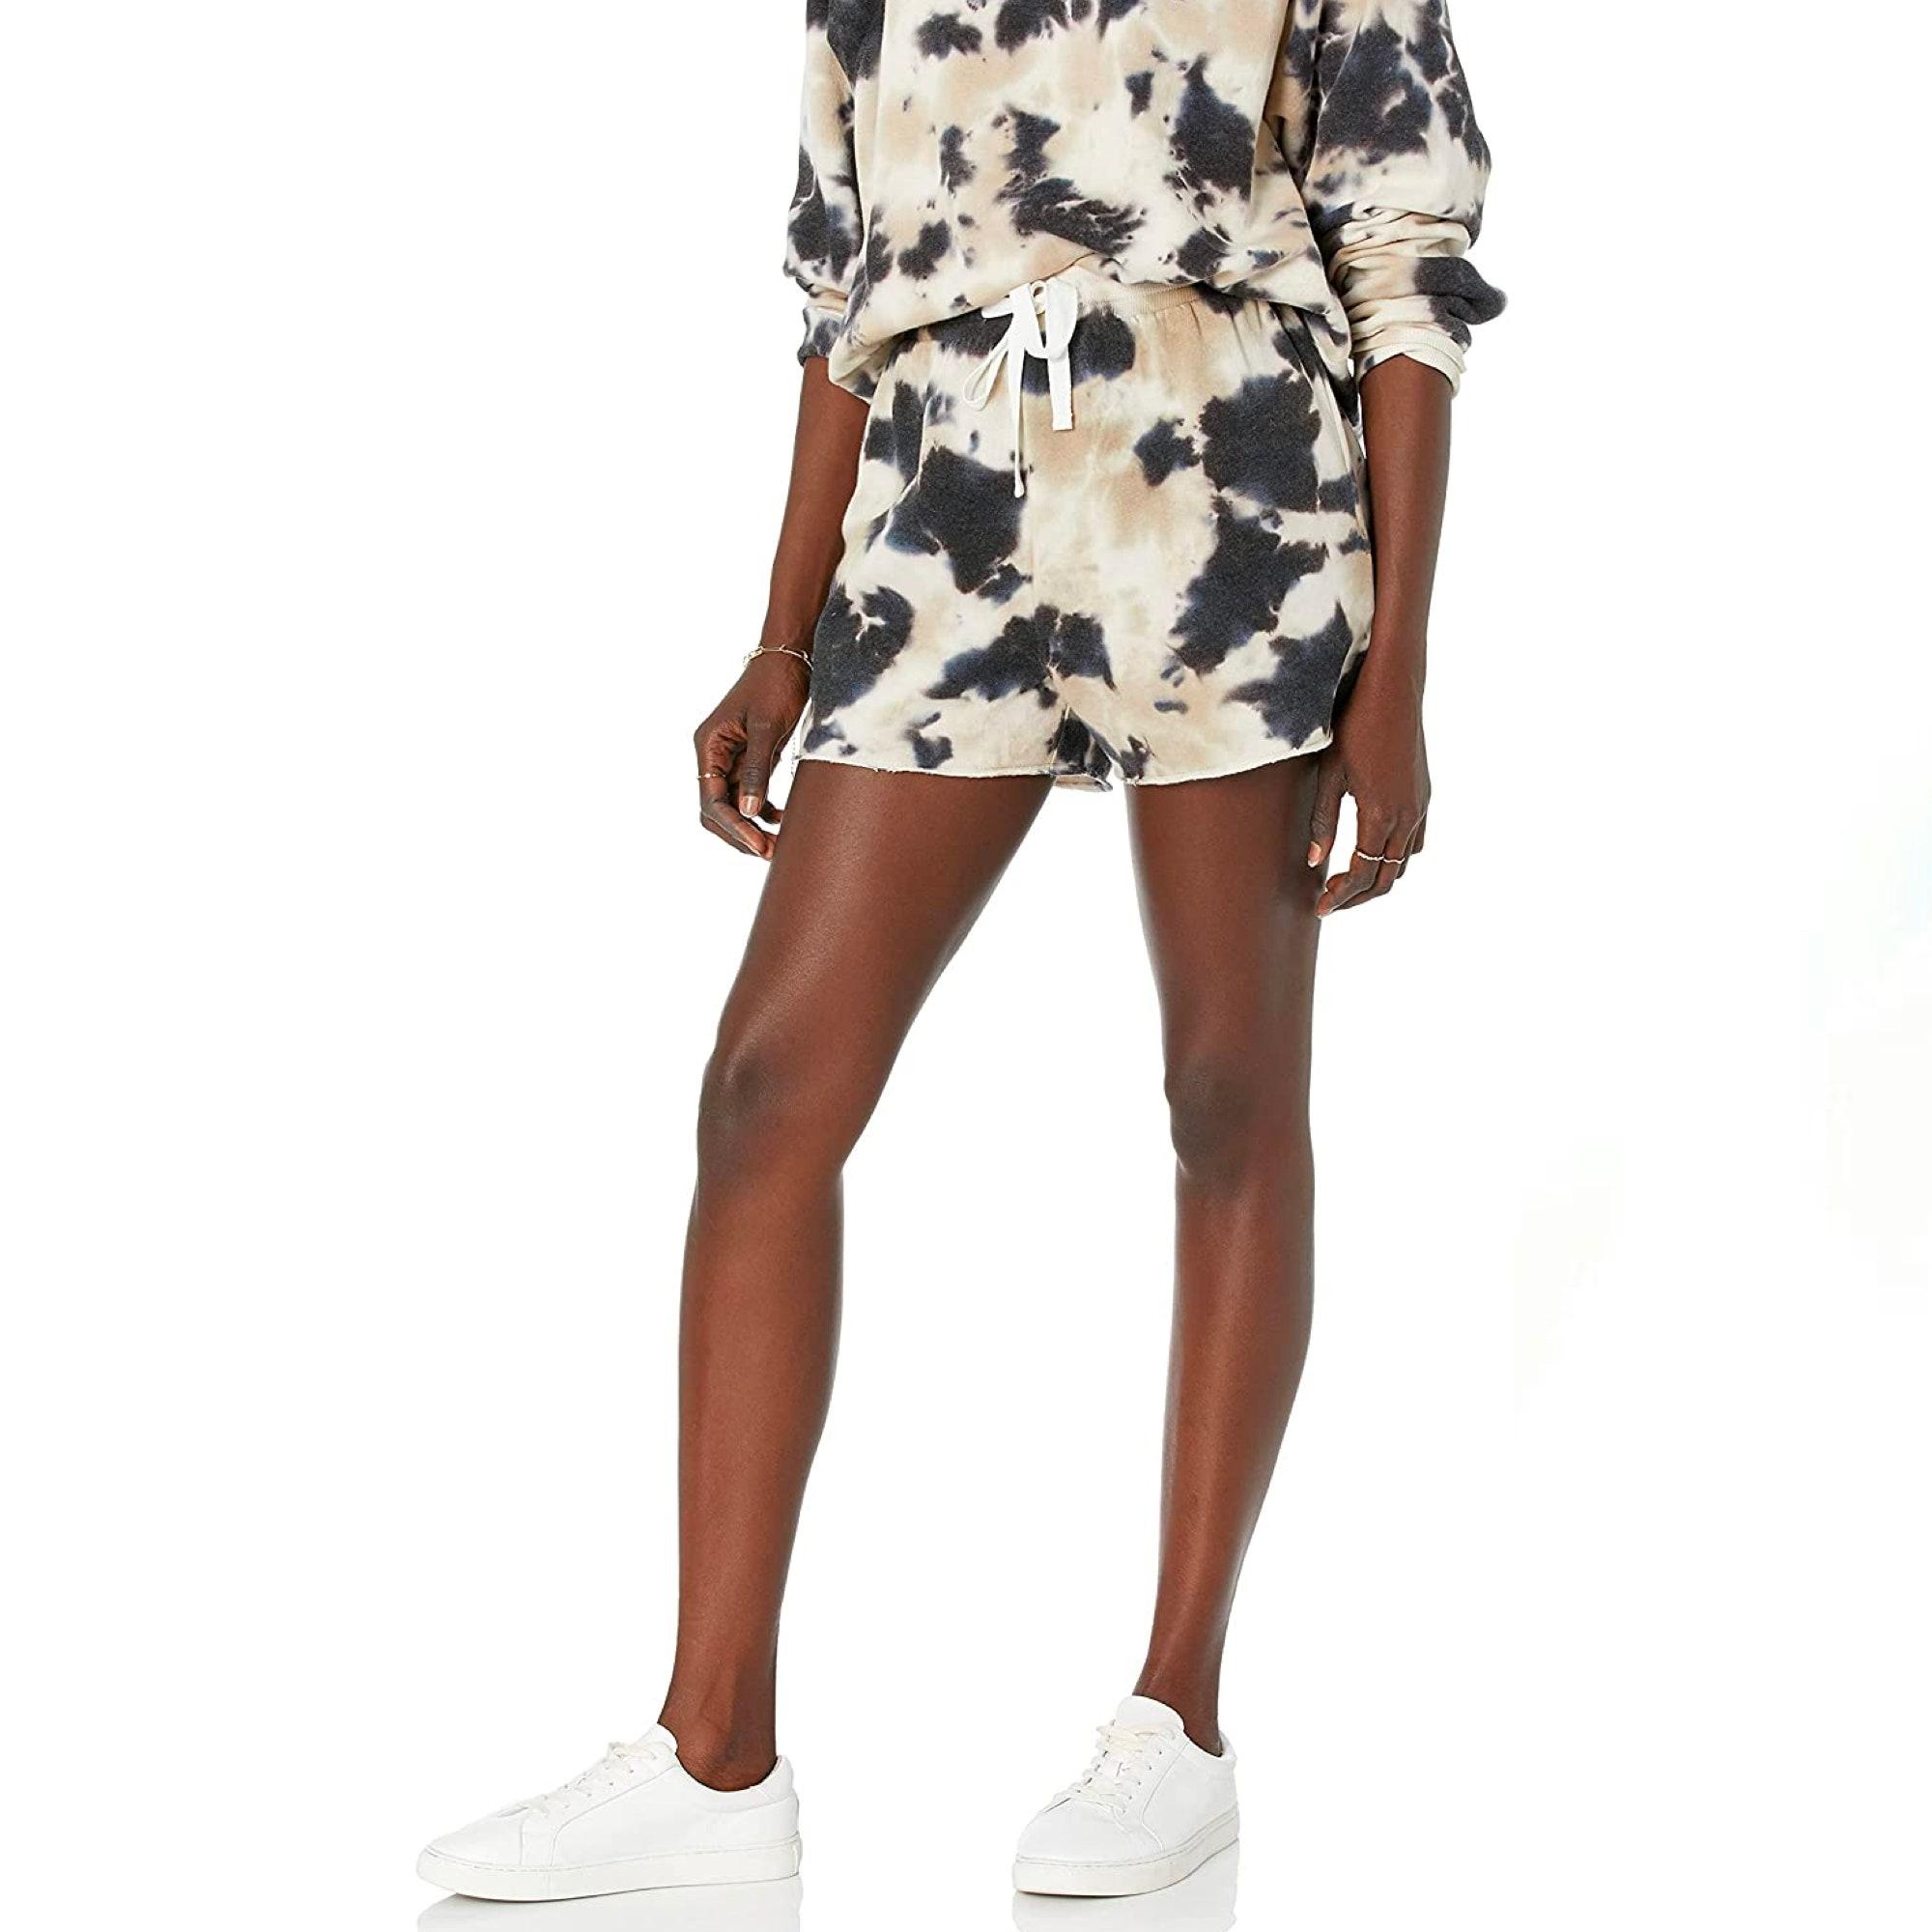 model wearing black and white tie dye shorts